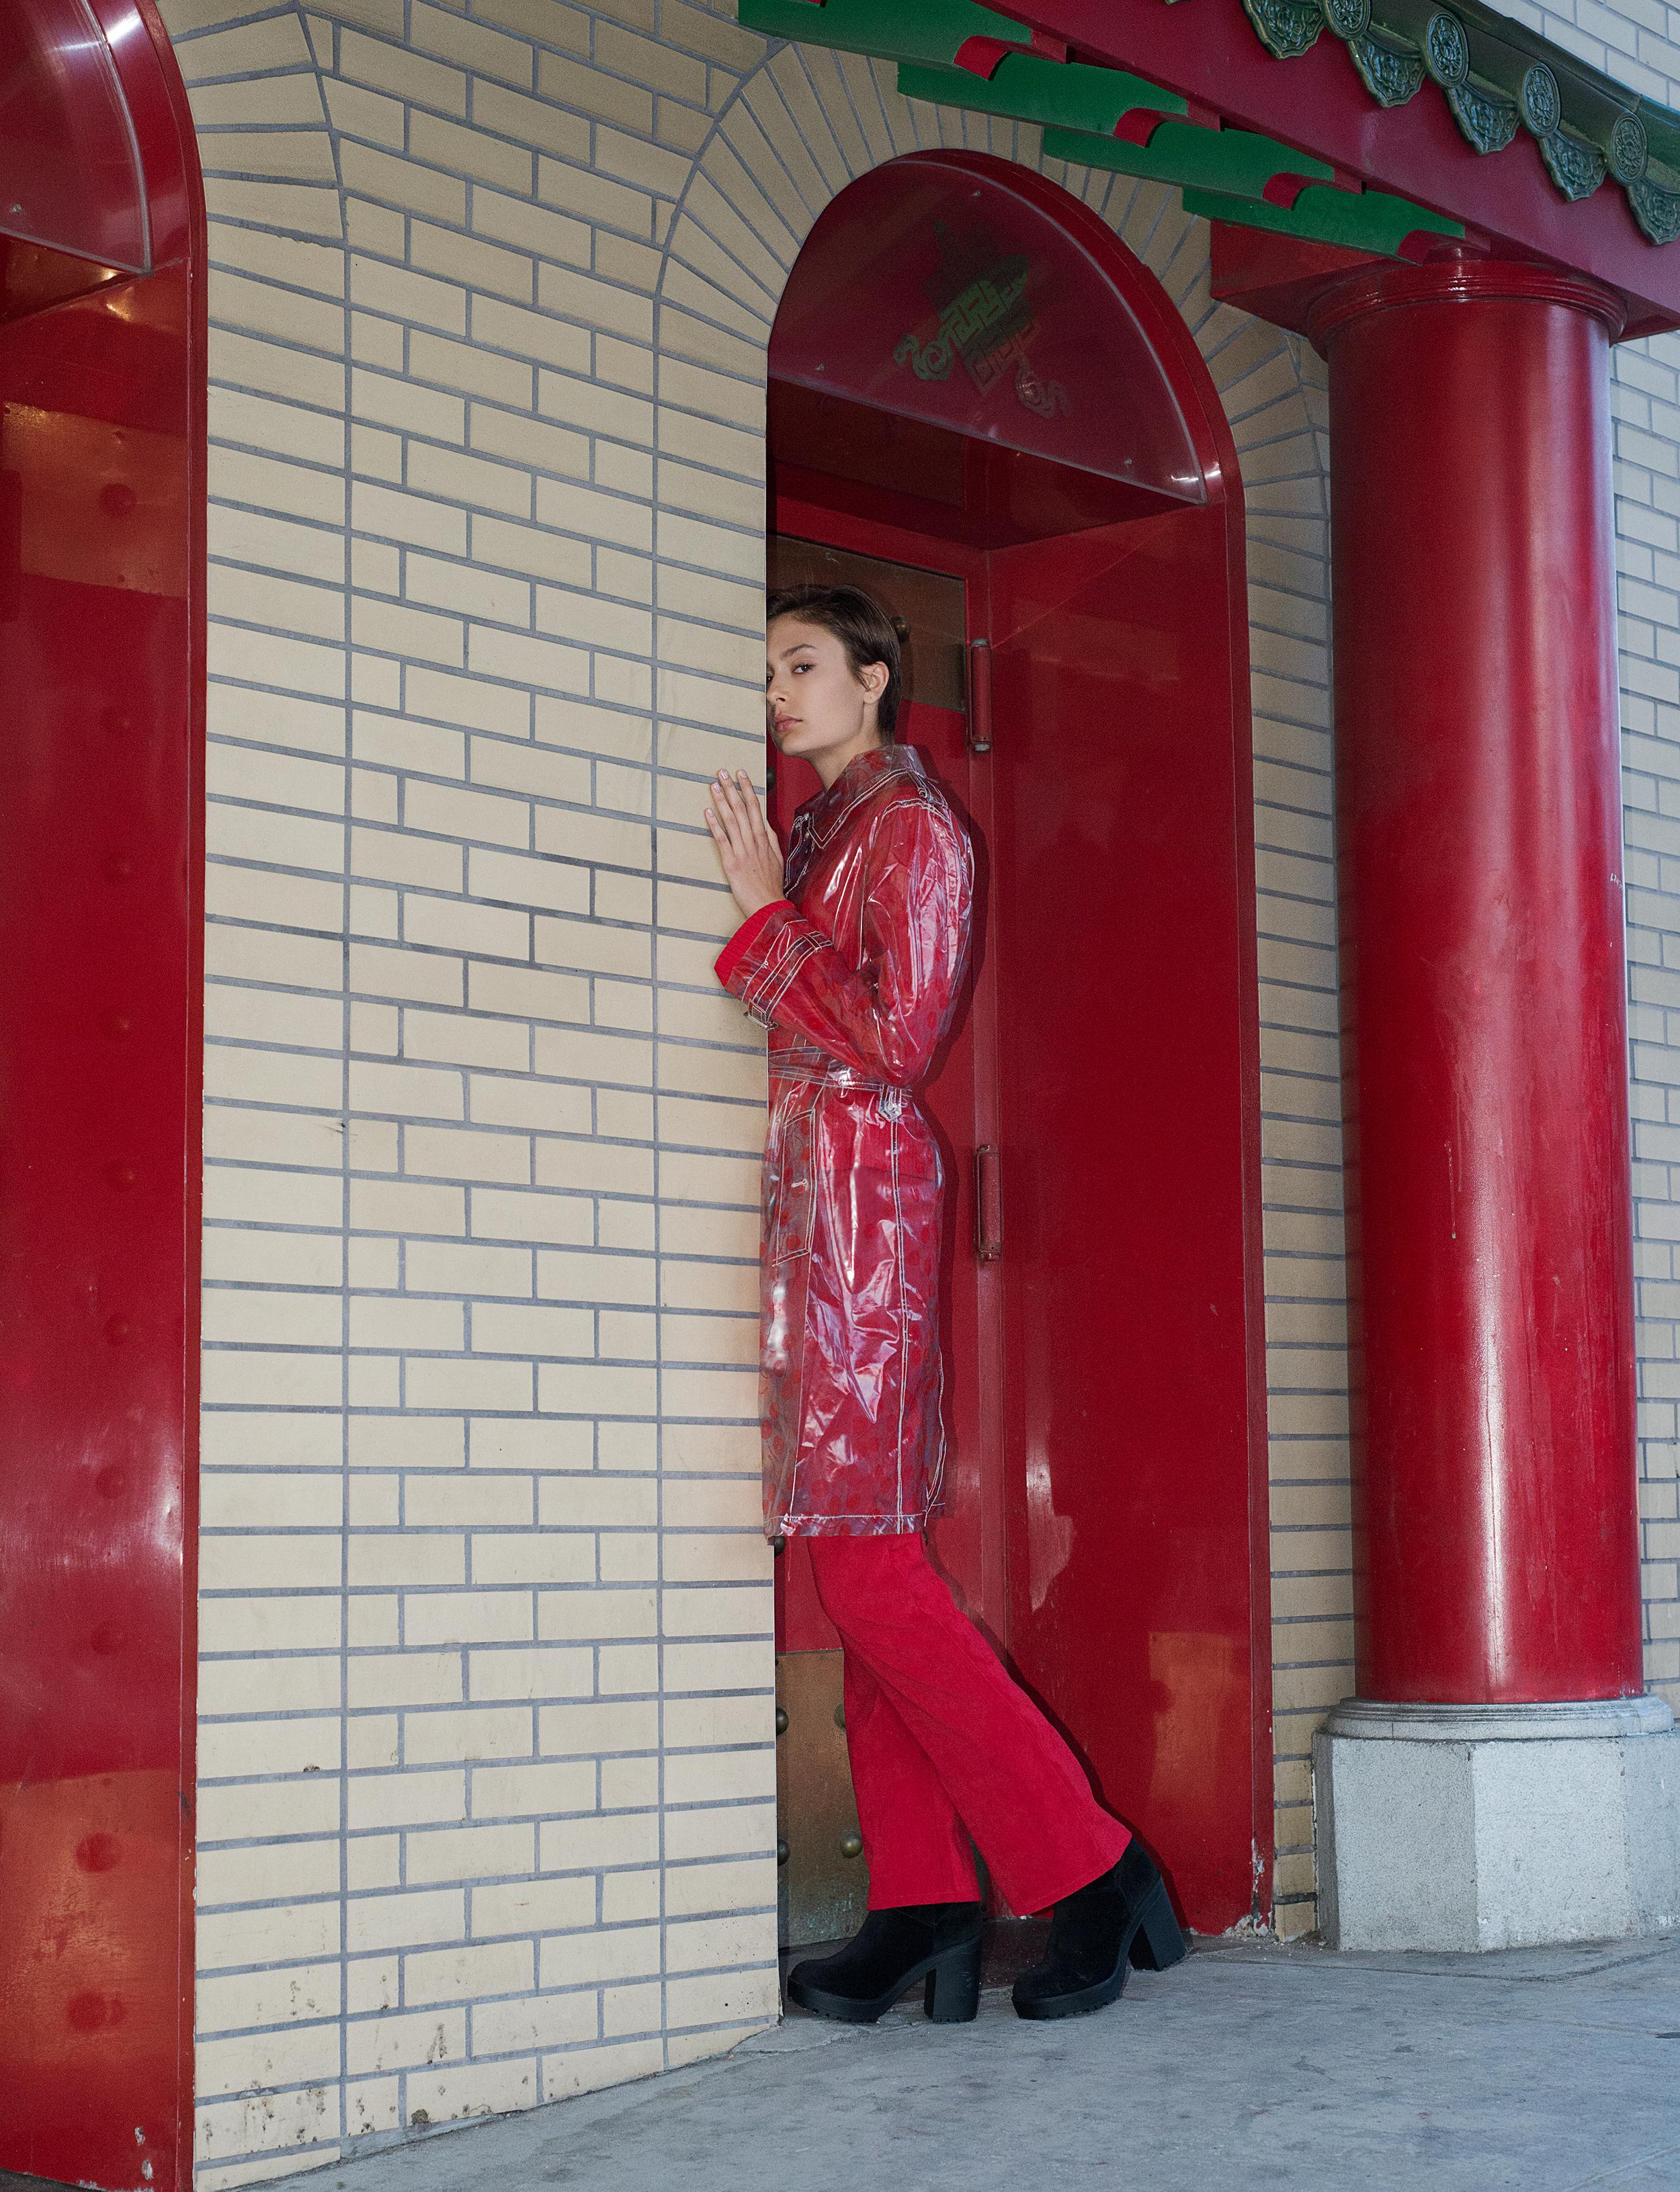 ALYSSA  Published On 27 October 2015   Photography  Steven Meidenbauer  Stylist  Logan Combs  Model  Alyssa Ball @Marilyn Model Management